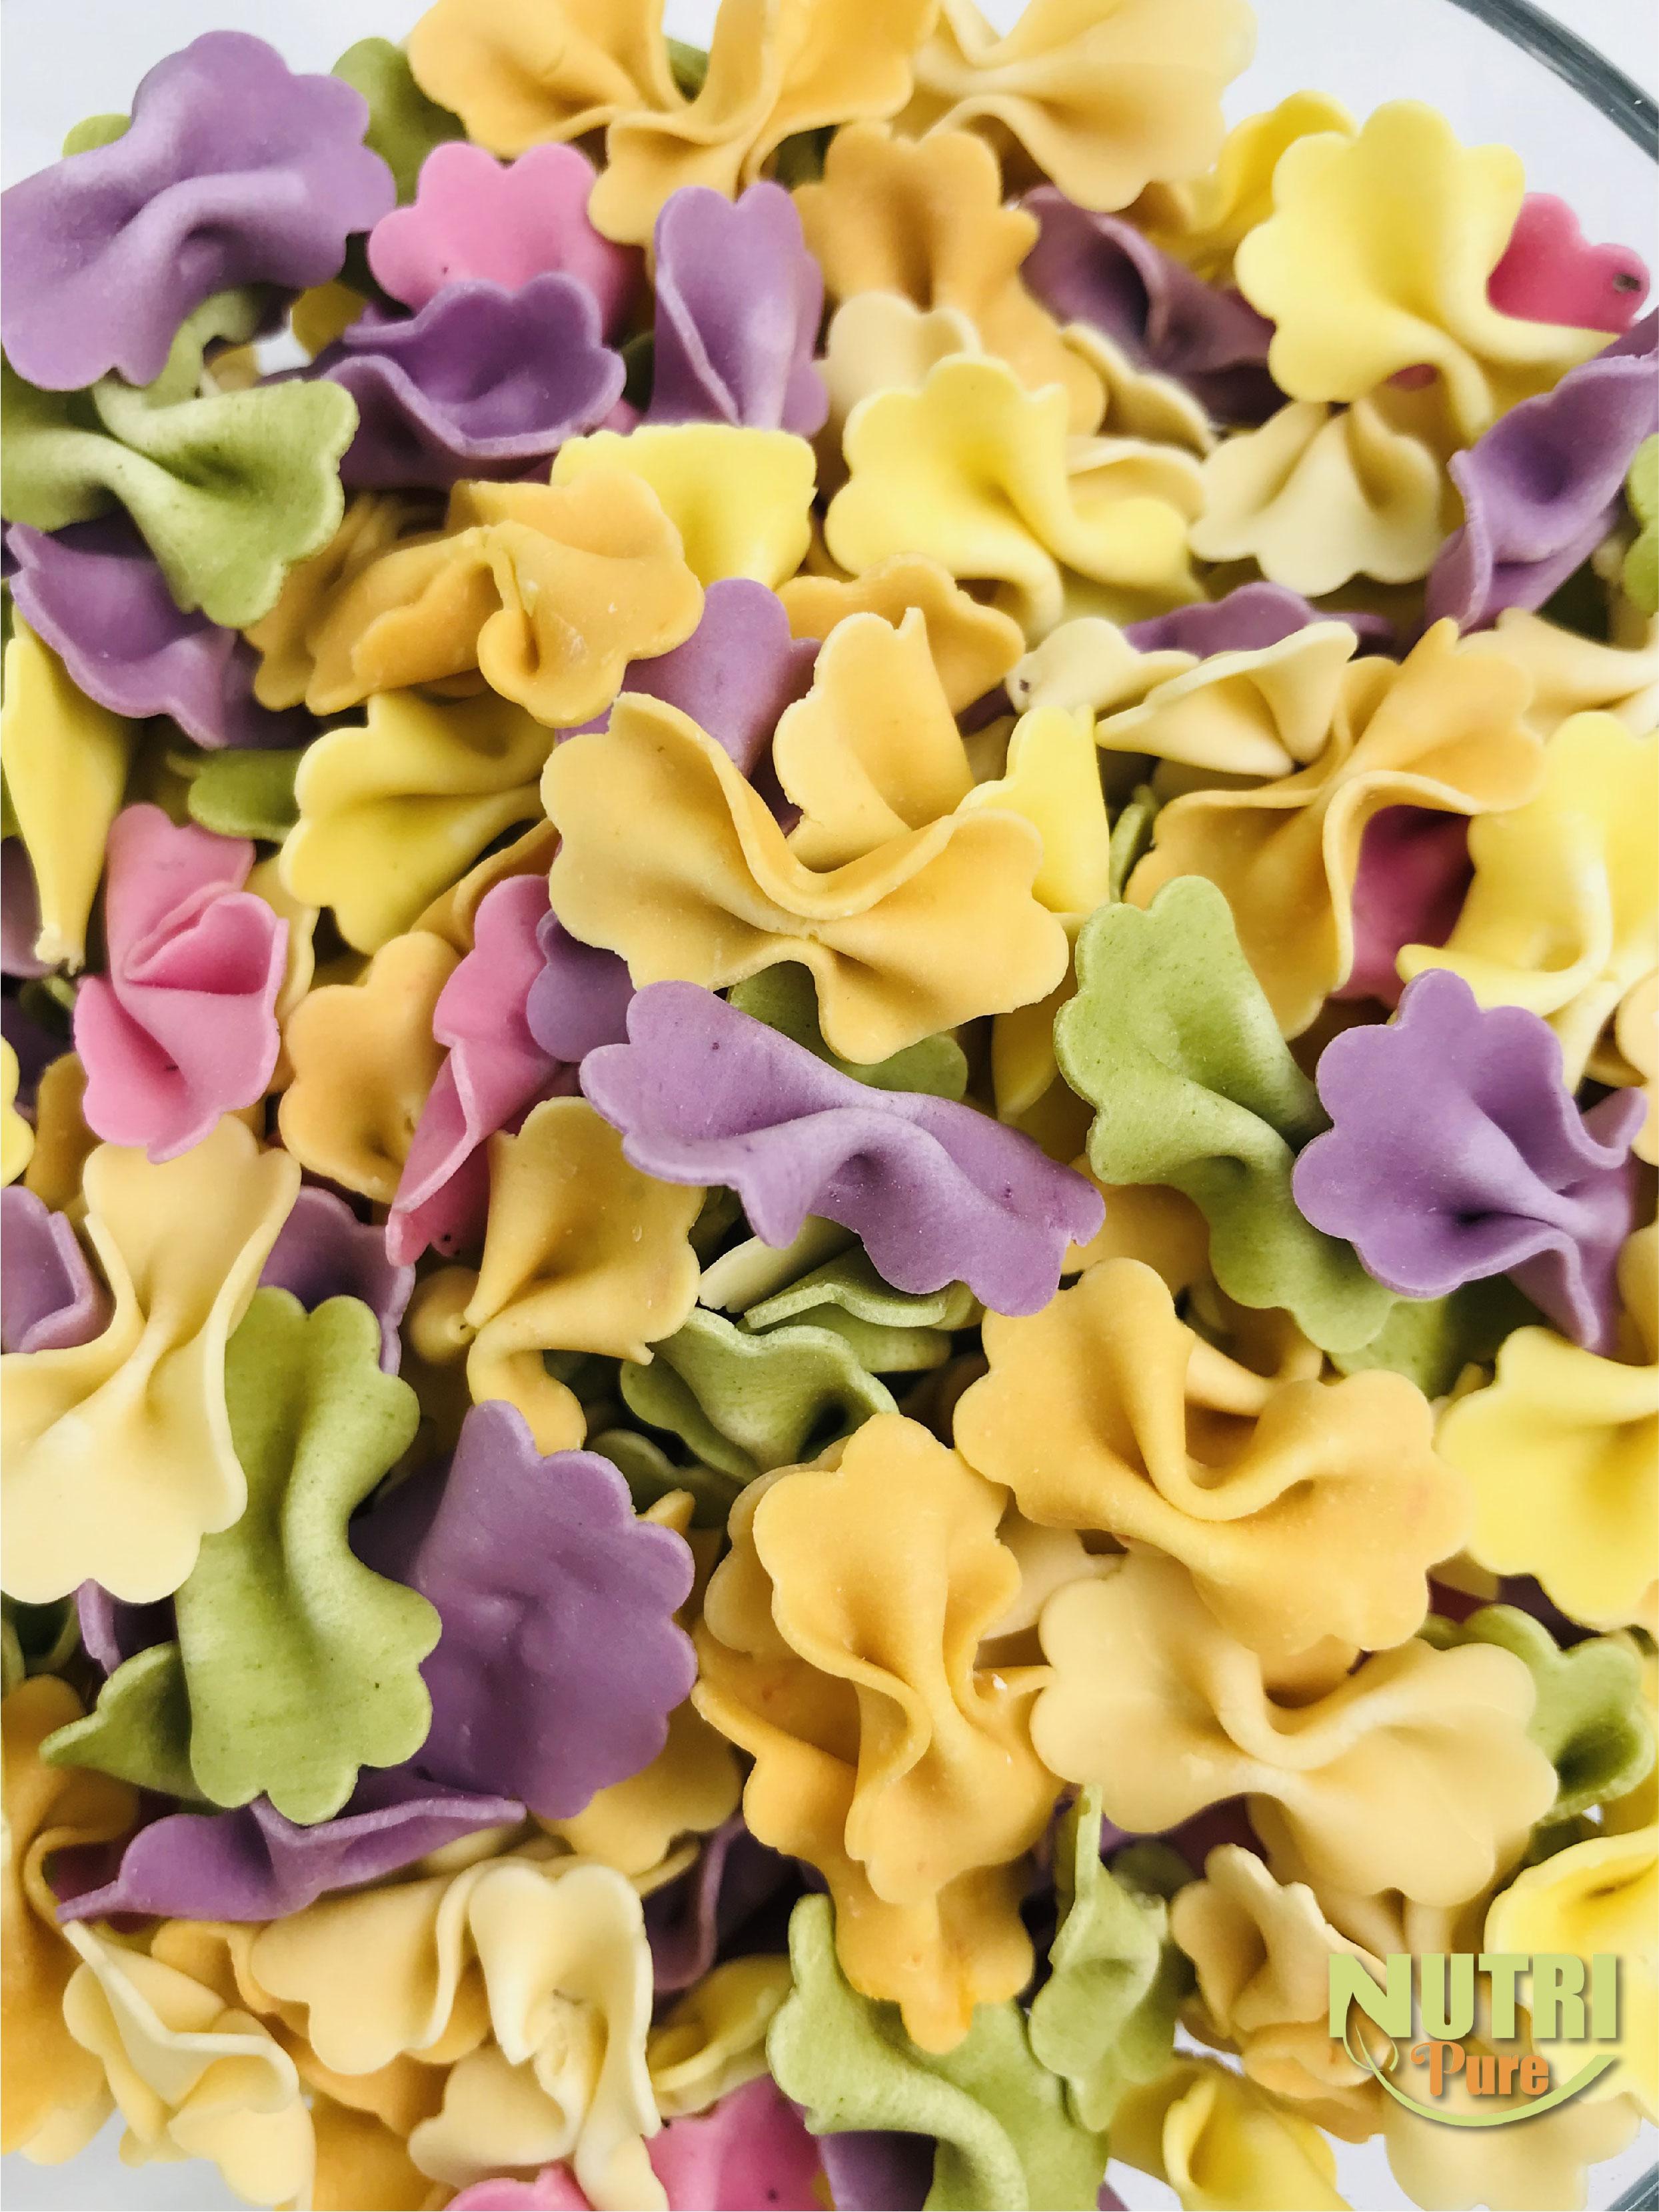 Nutri Pure Baby Noodle (Butterfly Shape) 200g   果蔬宝宝面 (蝴蝶形)